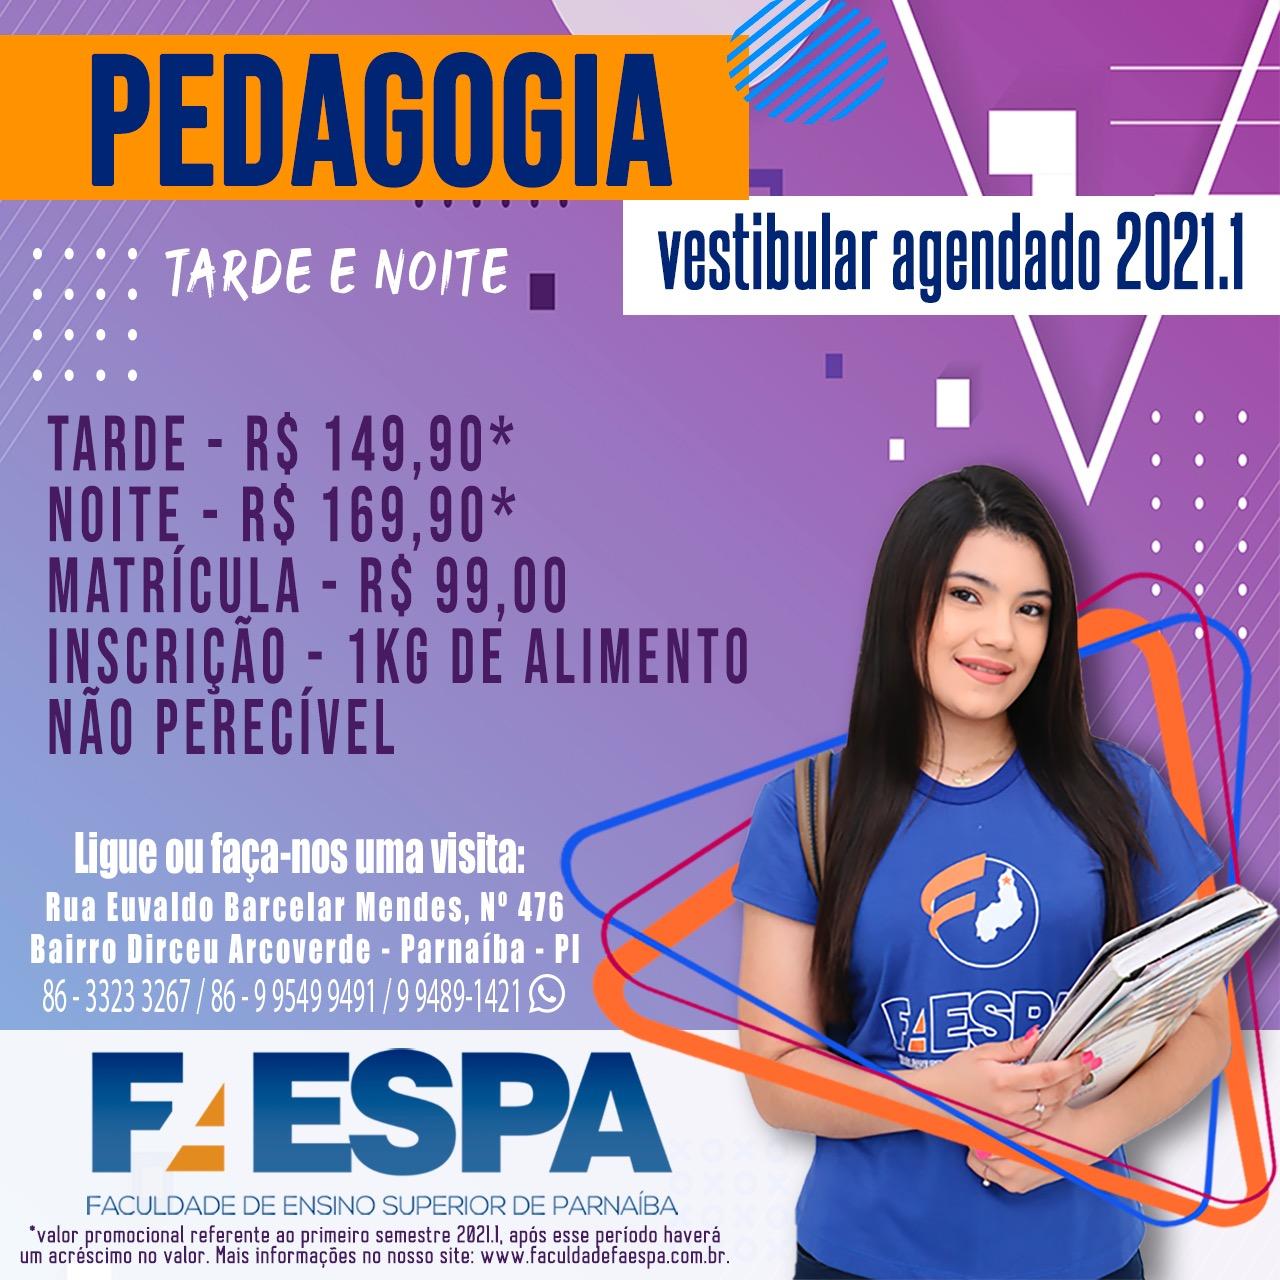 FAESPA - MATRICULAS ABERTAS